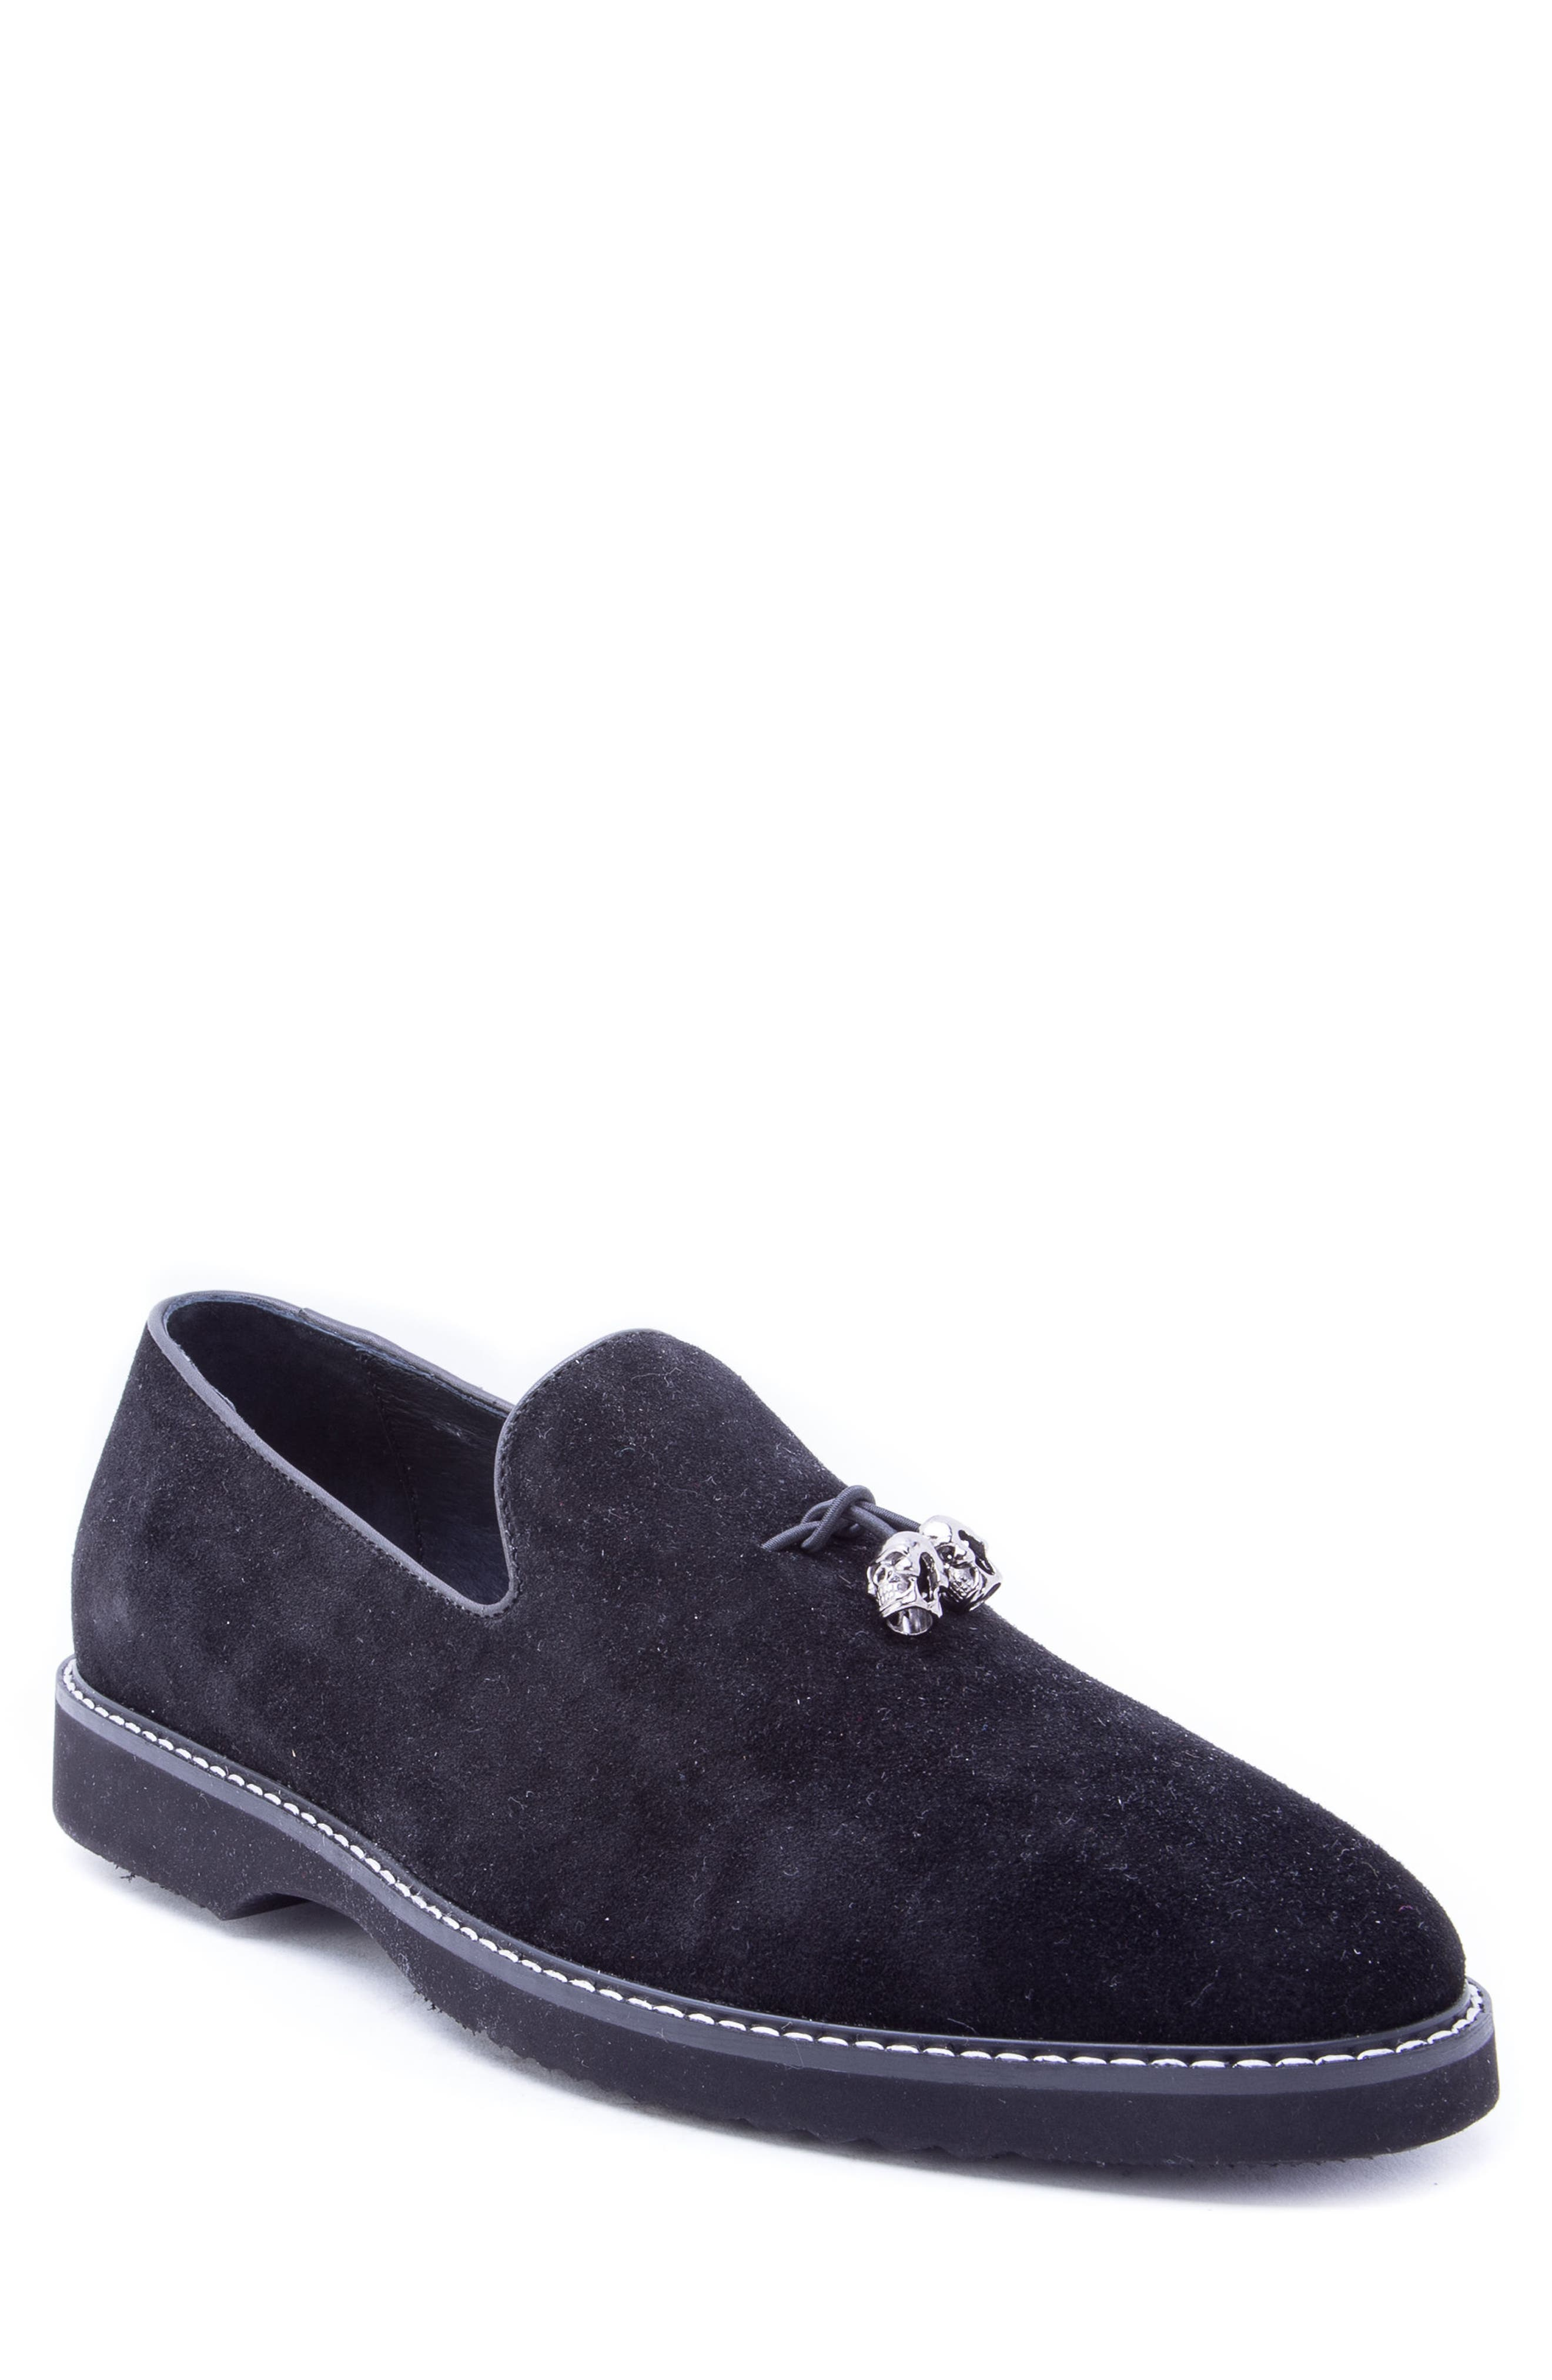 Badgley Mischka Heston Tassel Loafer,                             Main thumbnail 1, color,                             BLACK SUEDE